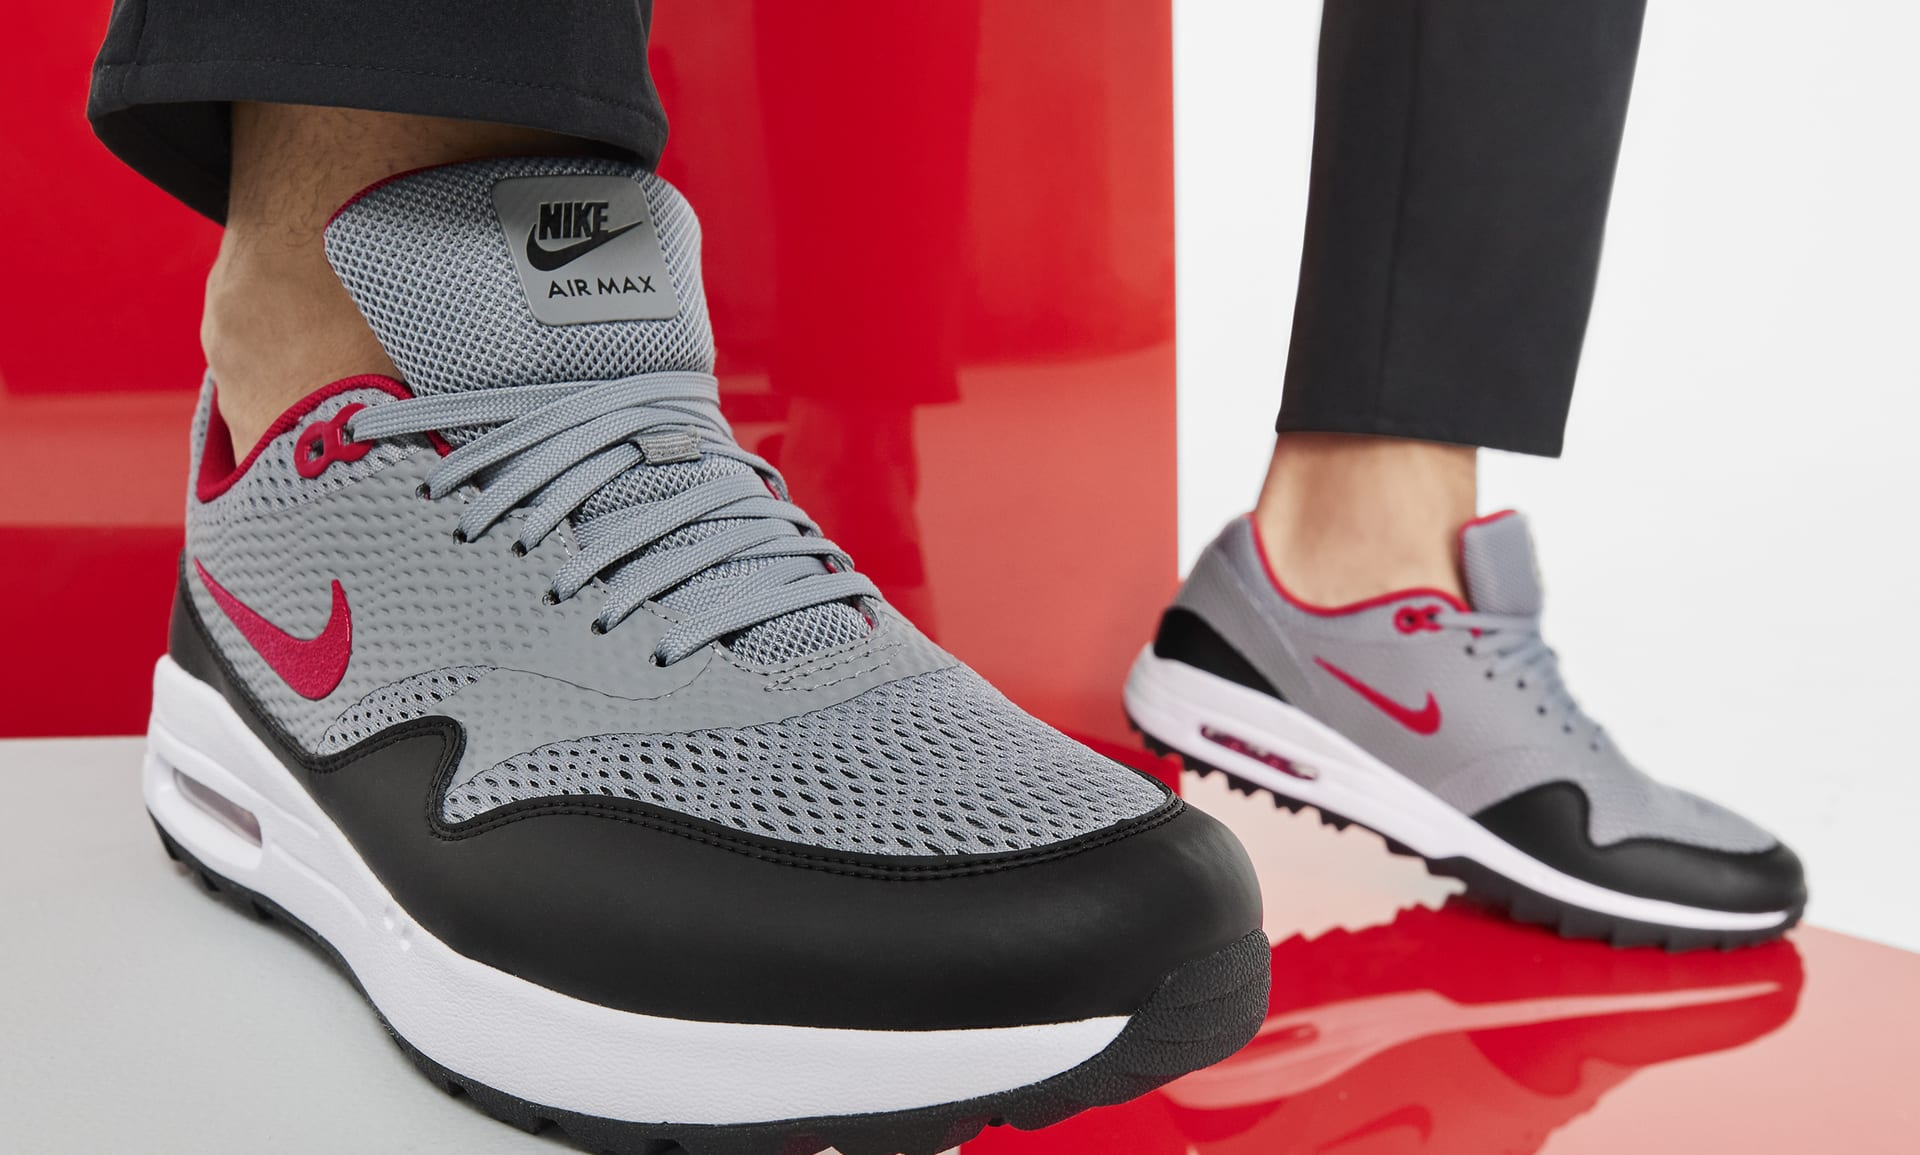 Nike Air Max 1 G Men's Golf Shoes. Nike.com